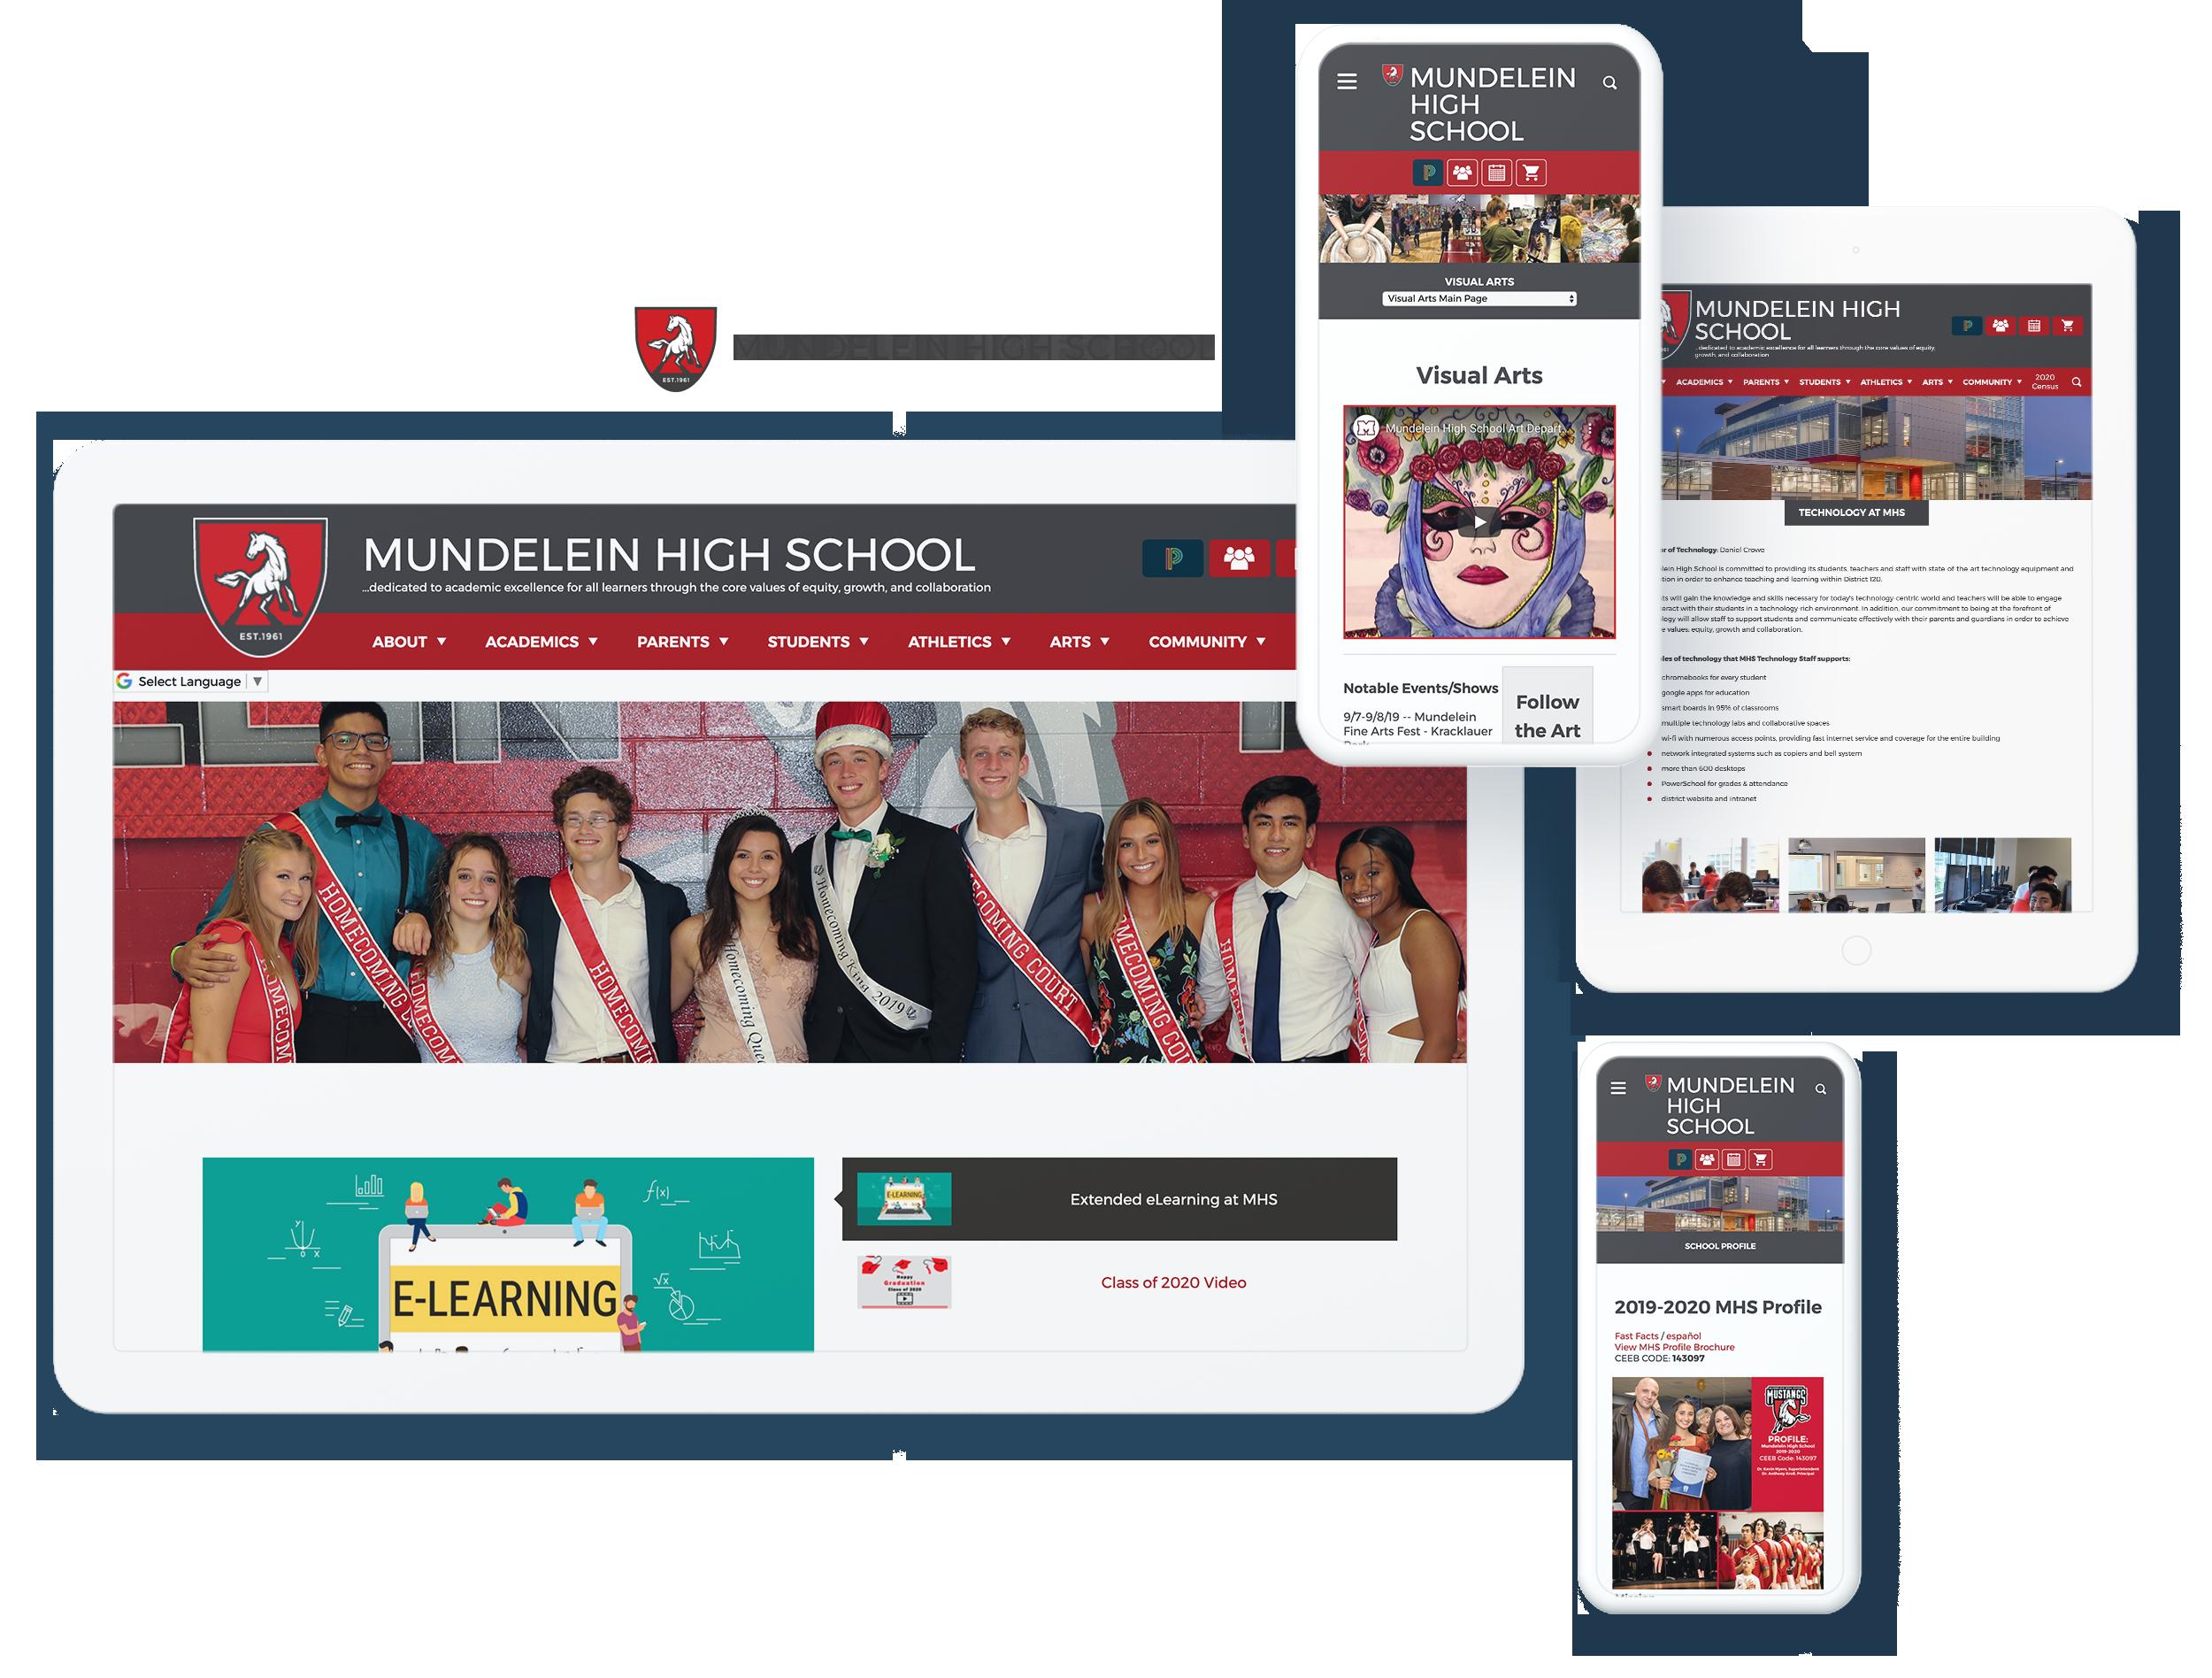 Mundelein_High_School_Spotlight